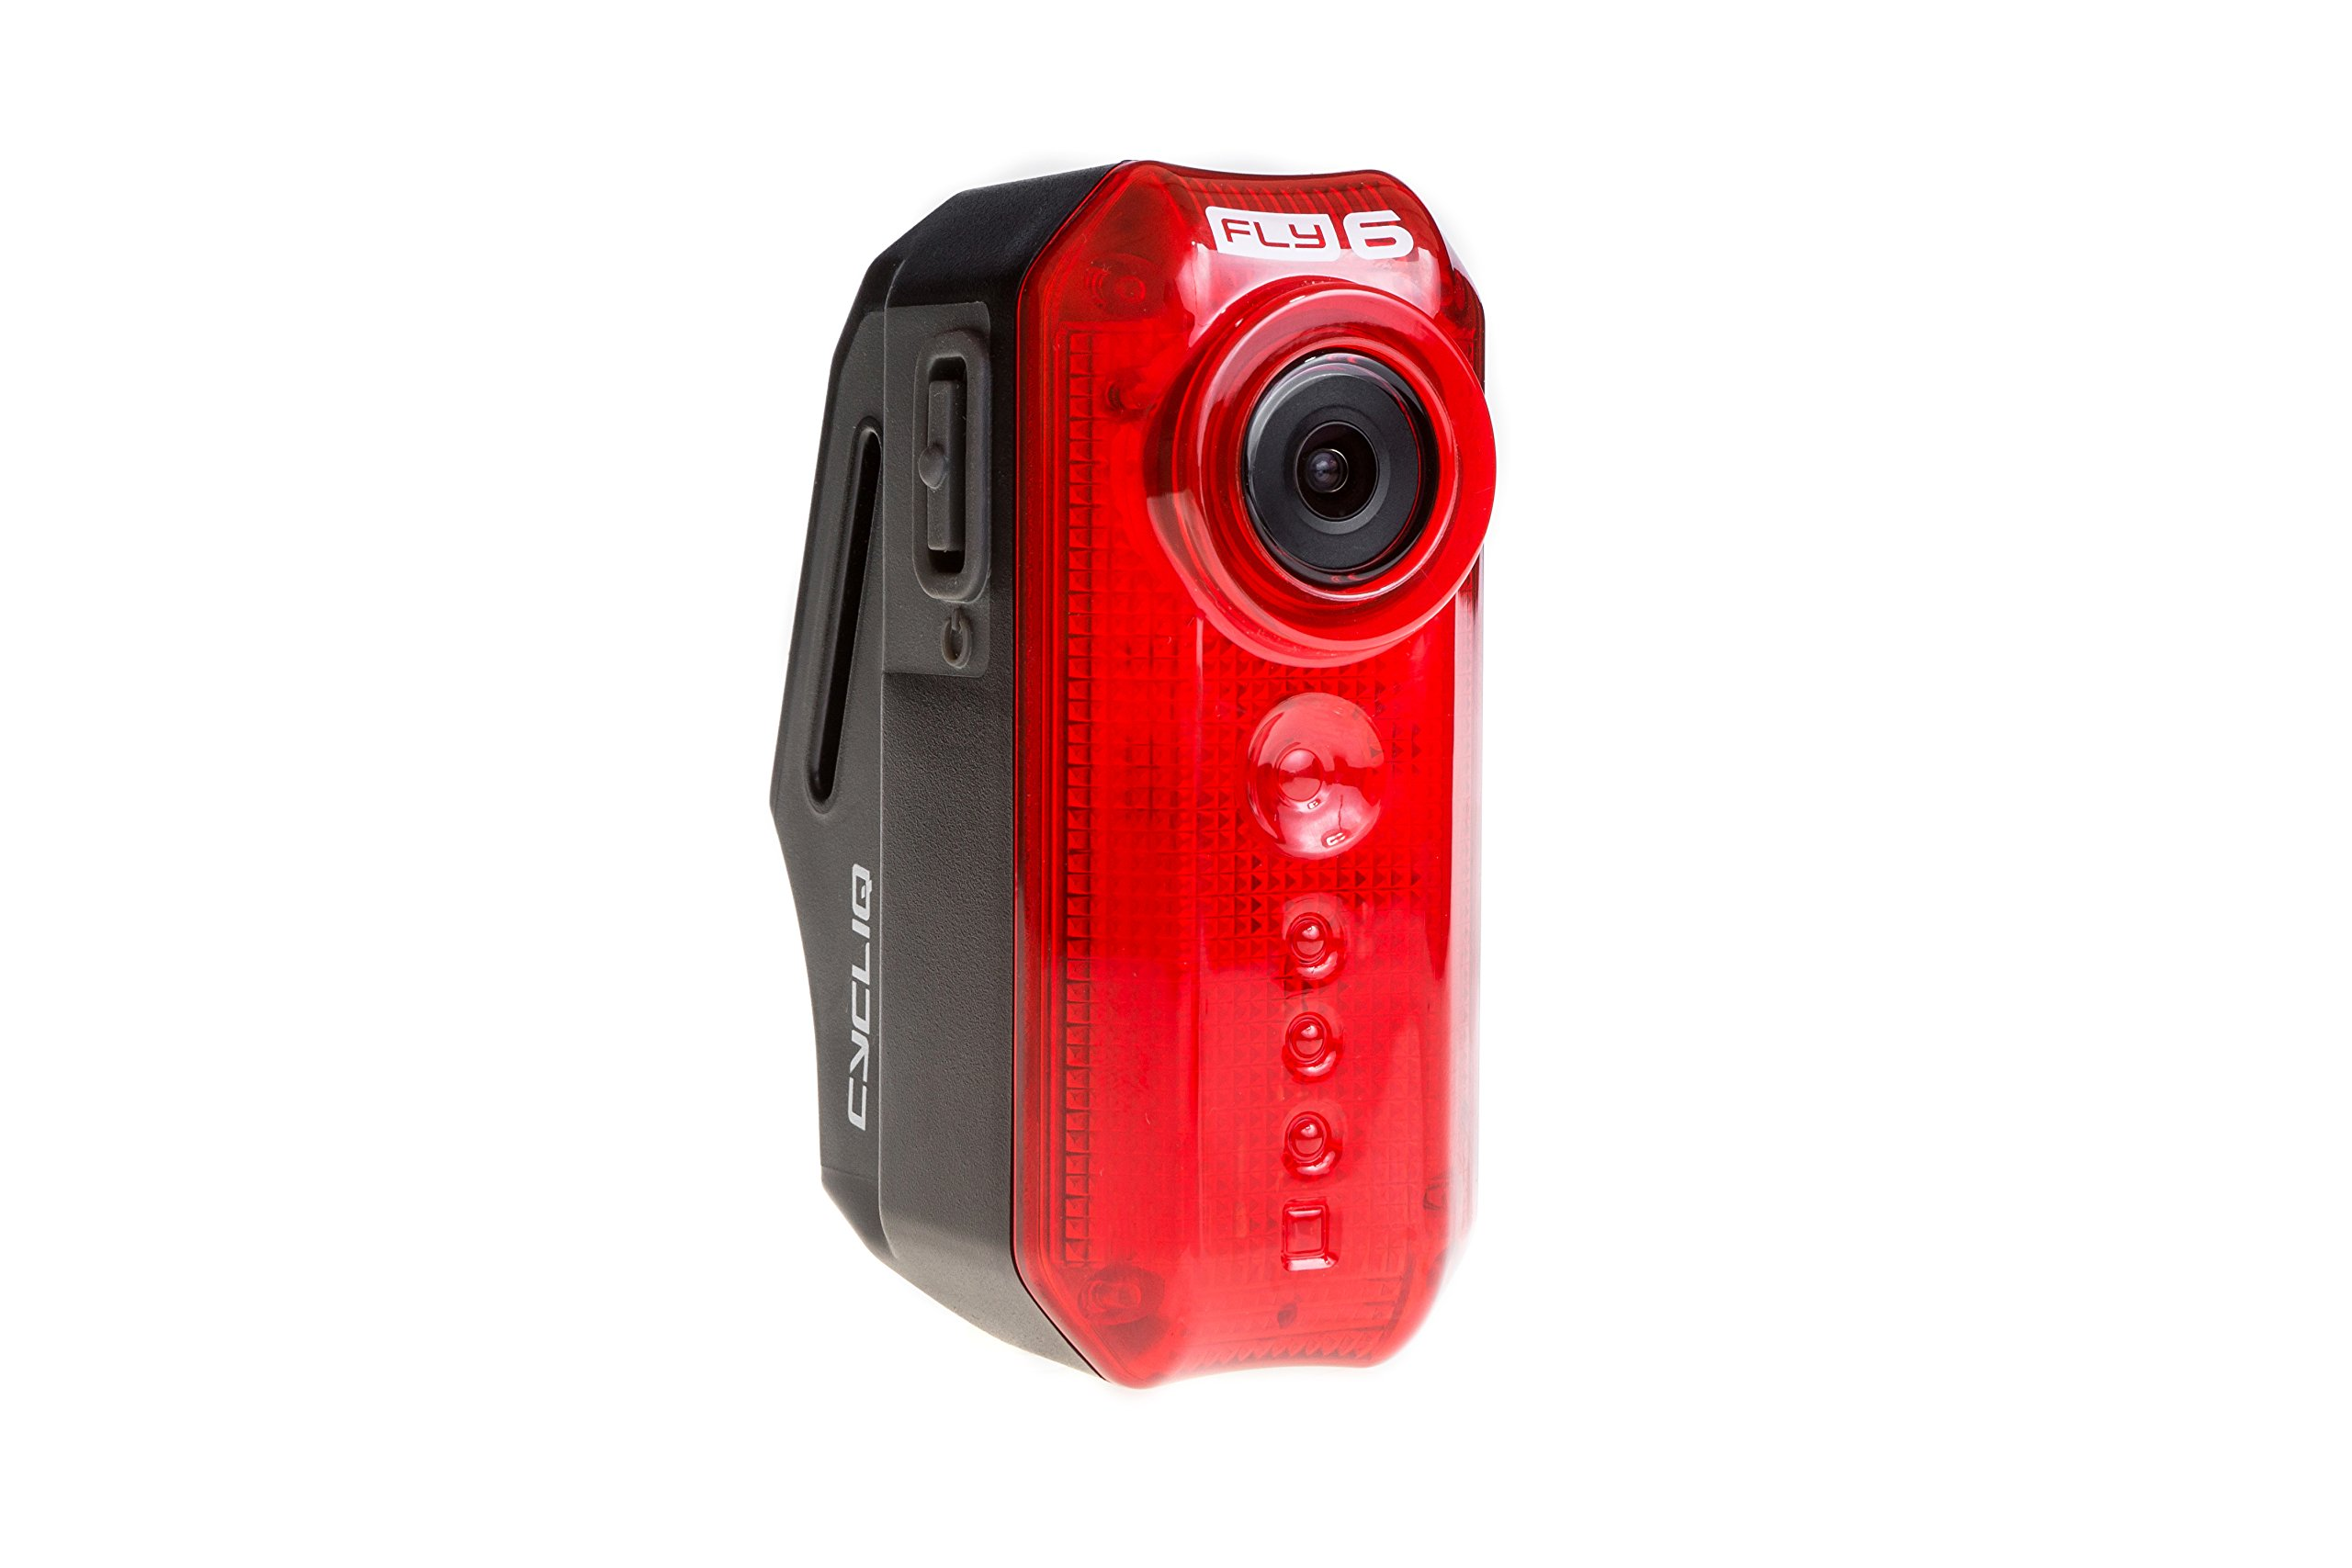 Fly6[v] HD Rear Bike Camera and 30 Lumen Tail light